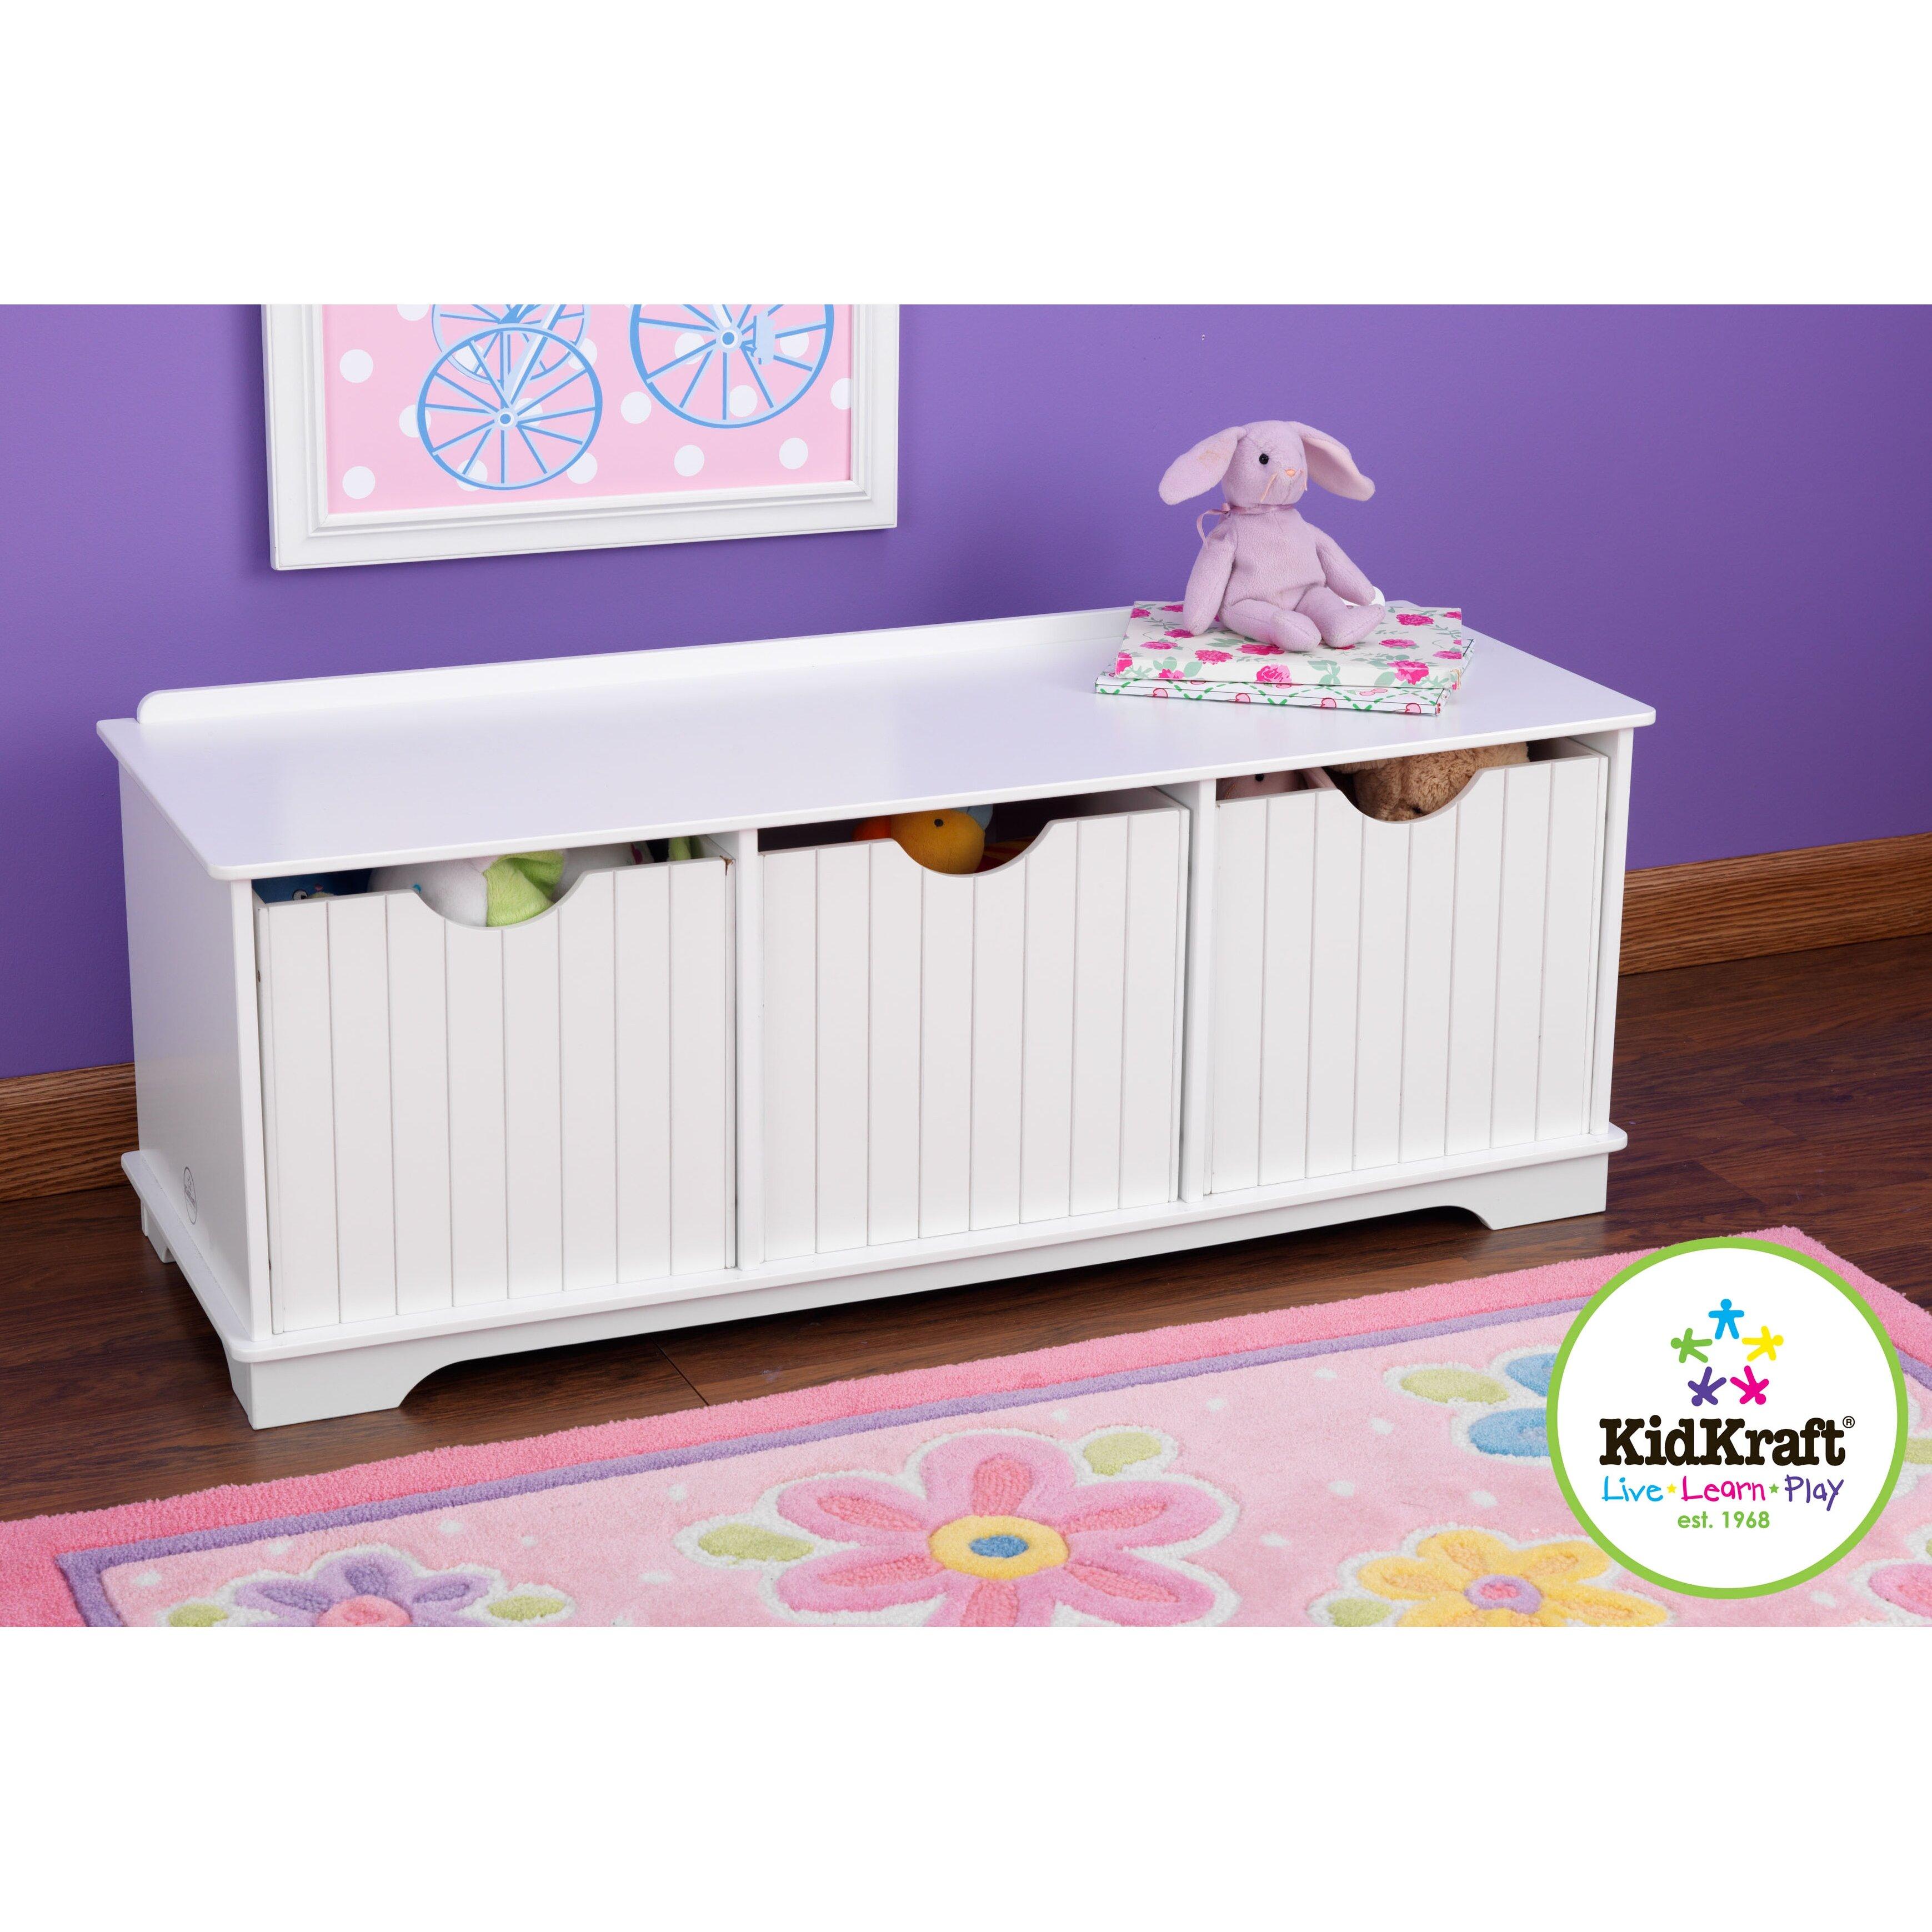 Kidkraft Petal Pink Kitchen Kidkraft Toy Boxes Youll Love Wayfair